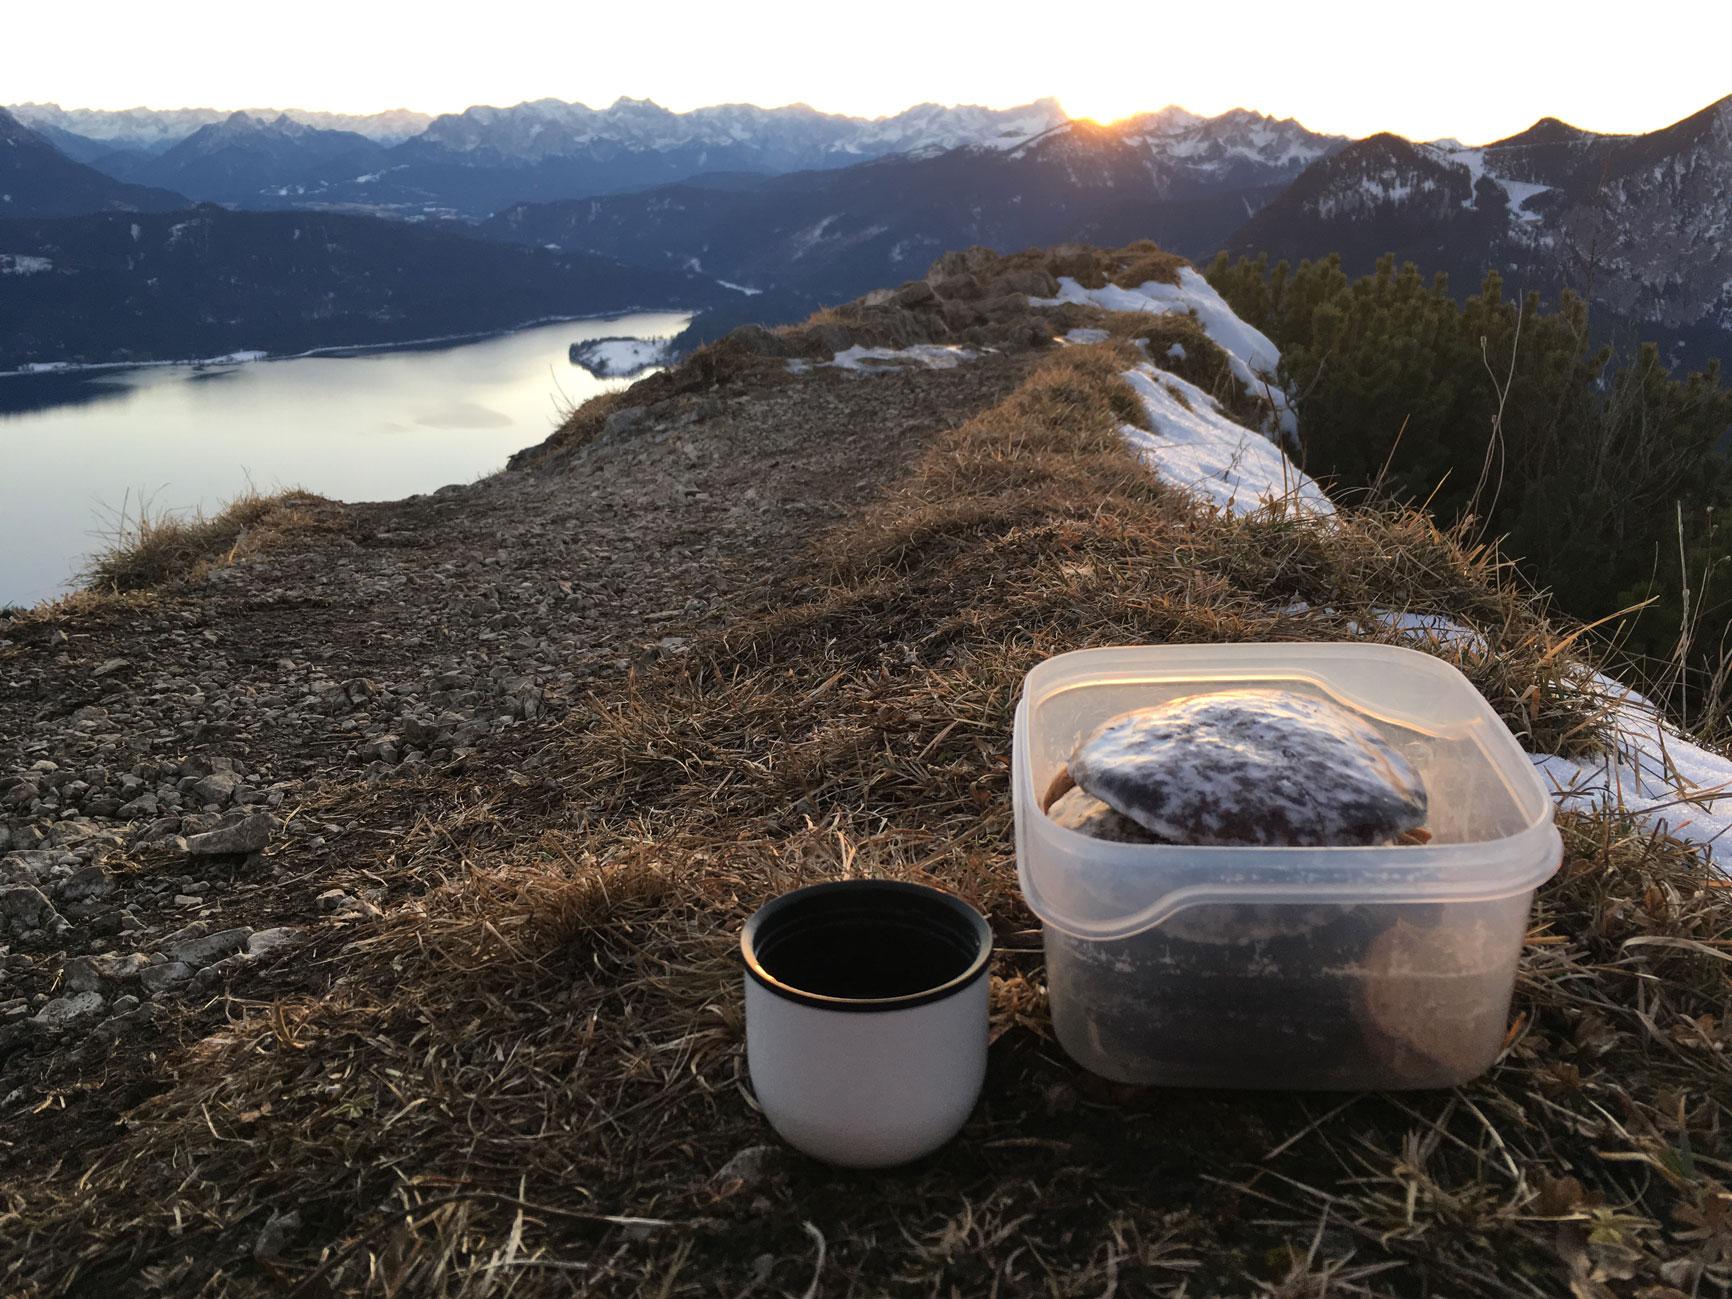 munichmountaingirls-bergblog-muenchen-julia-eisenhardt-wandern-karwendel-sonnenuntergang-jochberg-wandern